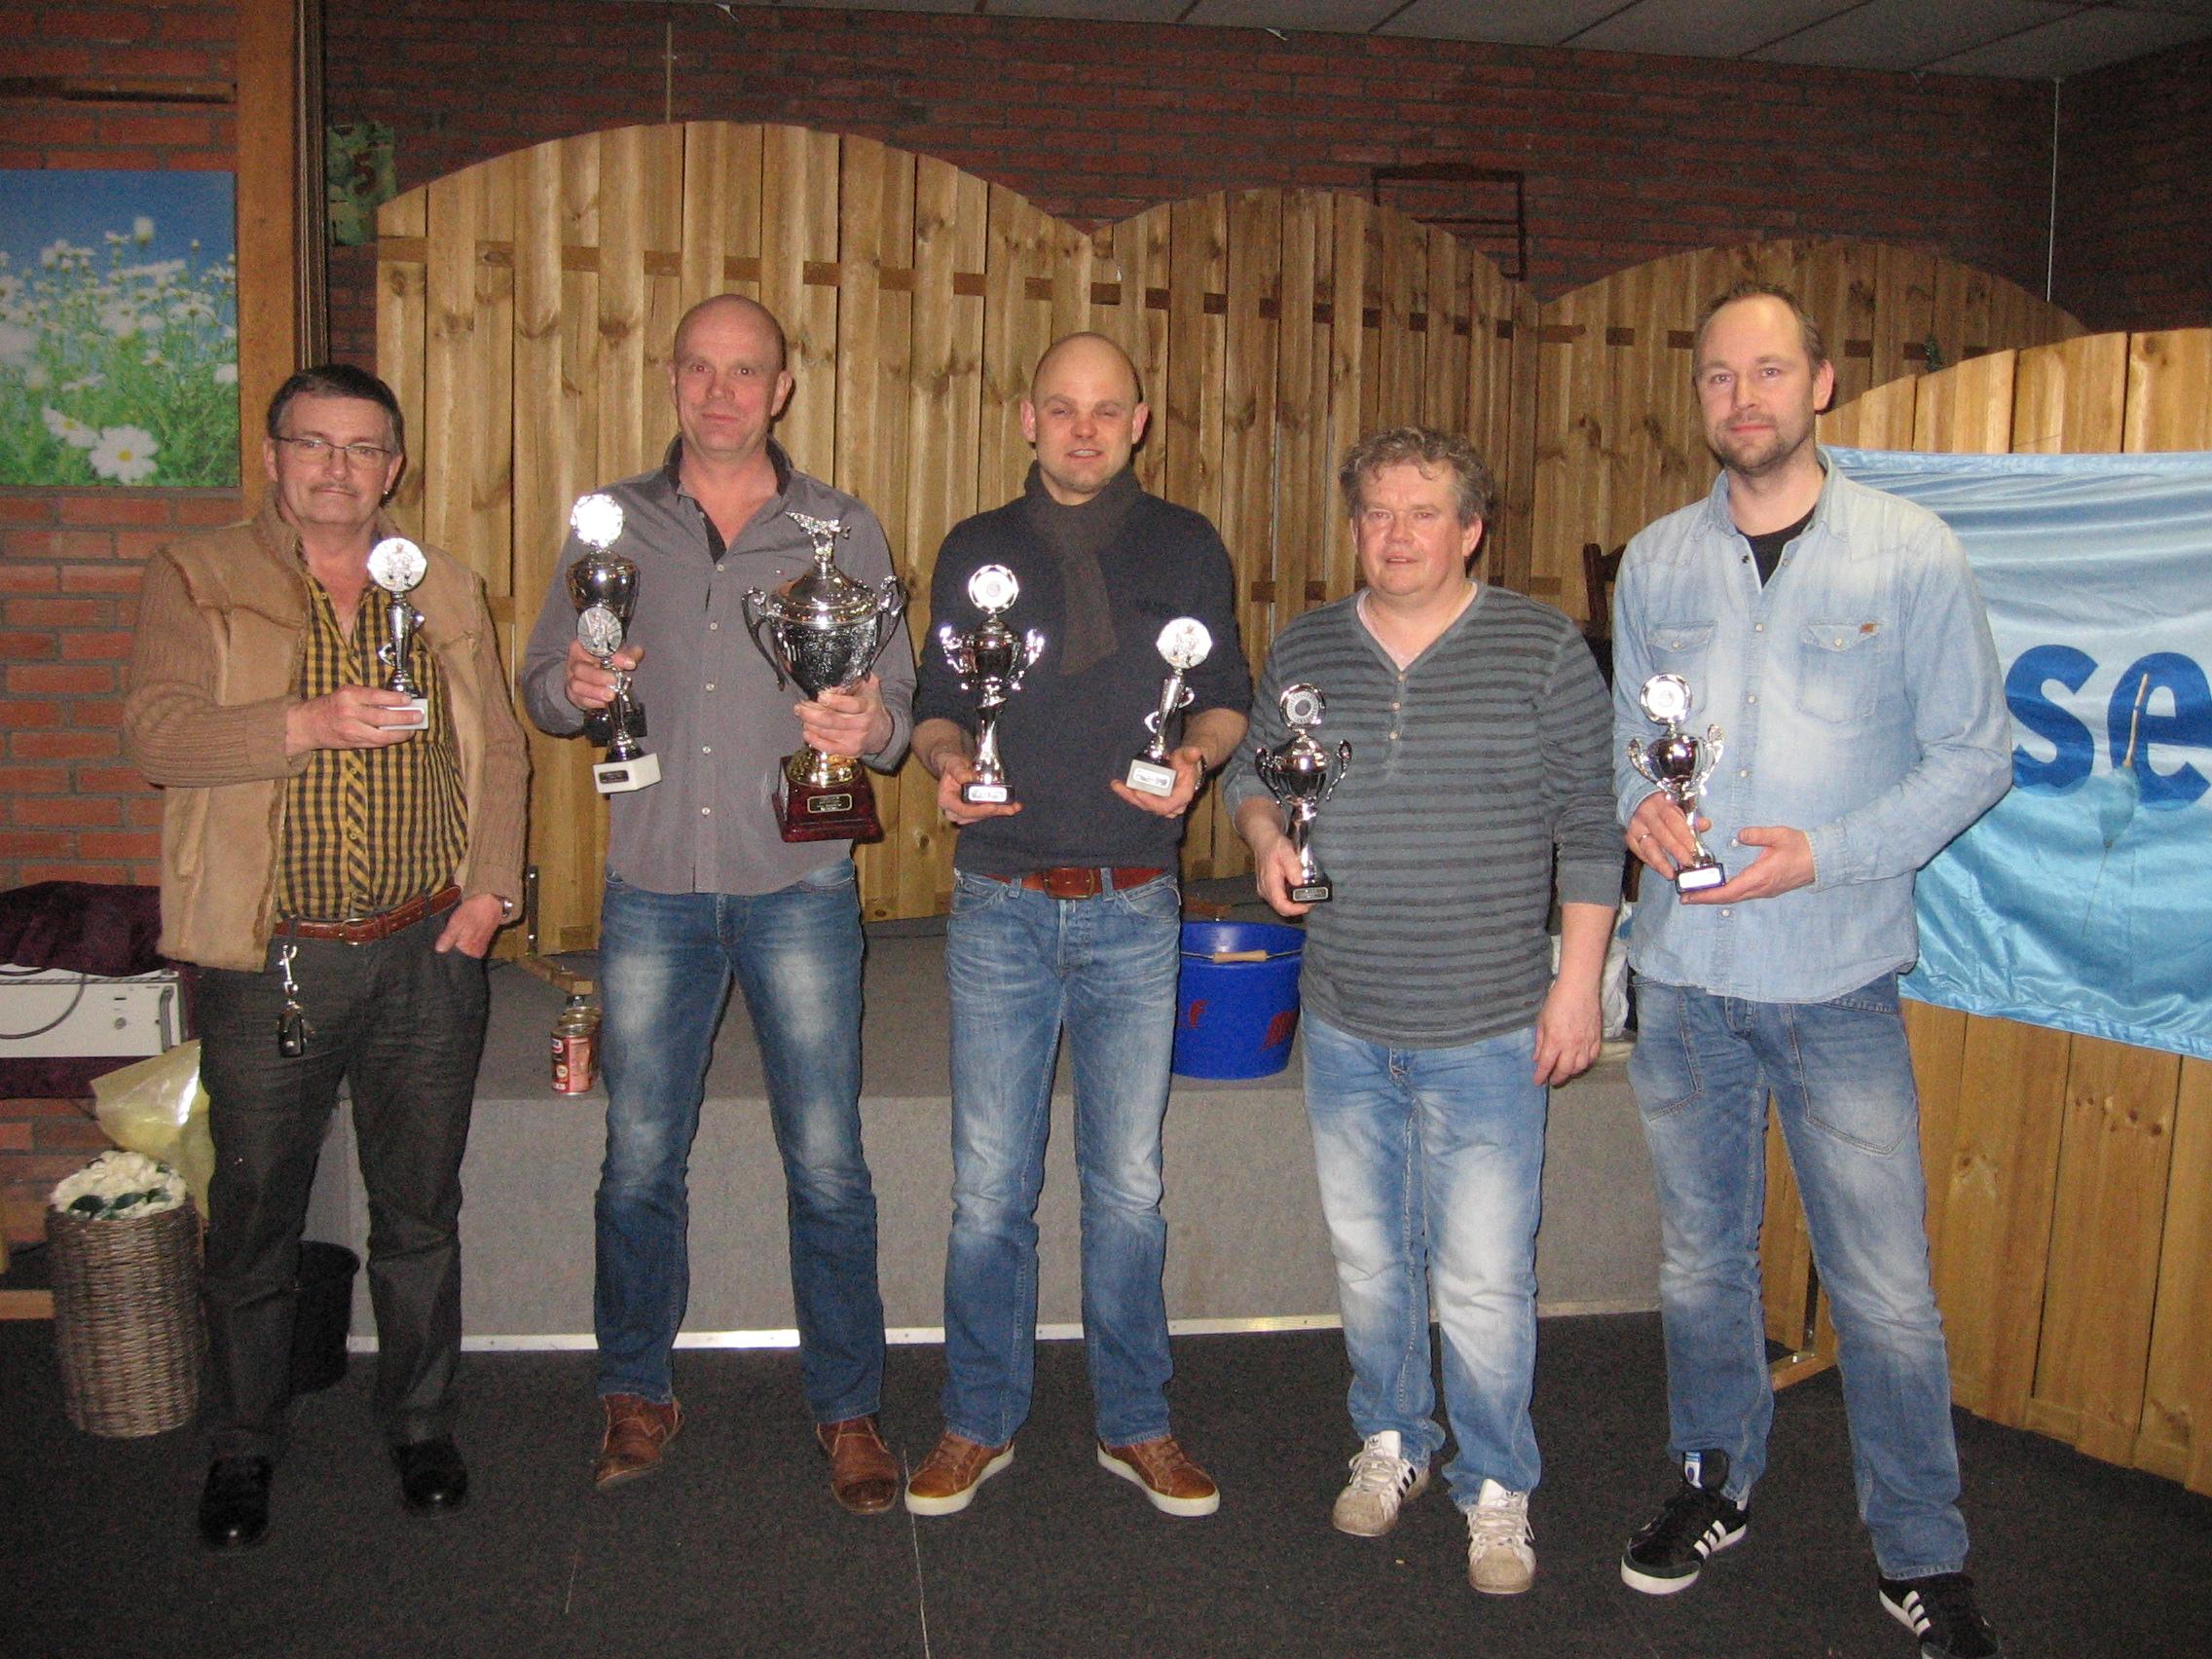 De prijswinnaars vlnr: D. van Dijk, R. Pijl, R. Veldman, T. Helmholt, B. Feenstra